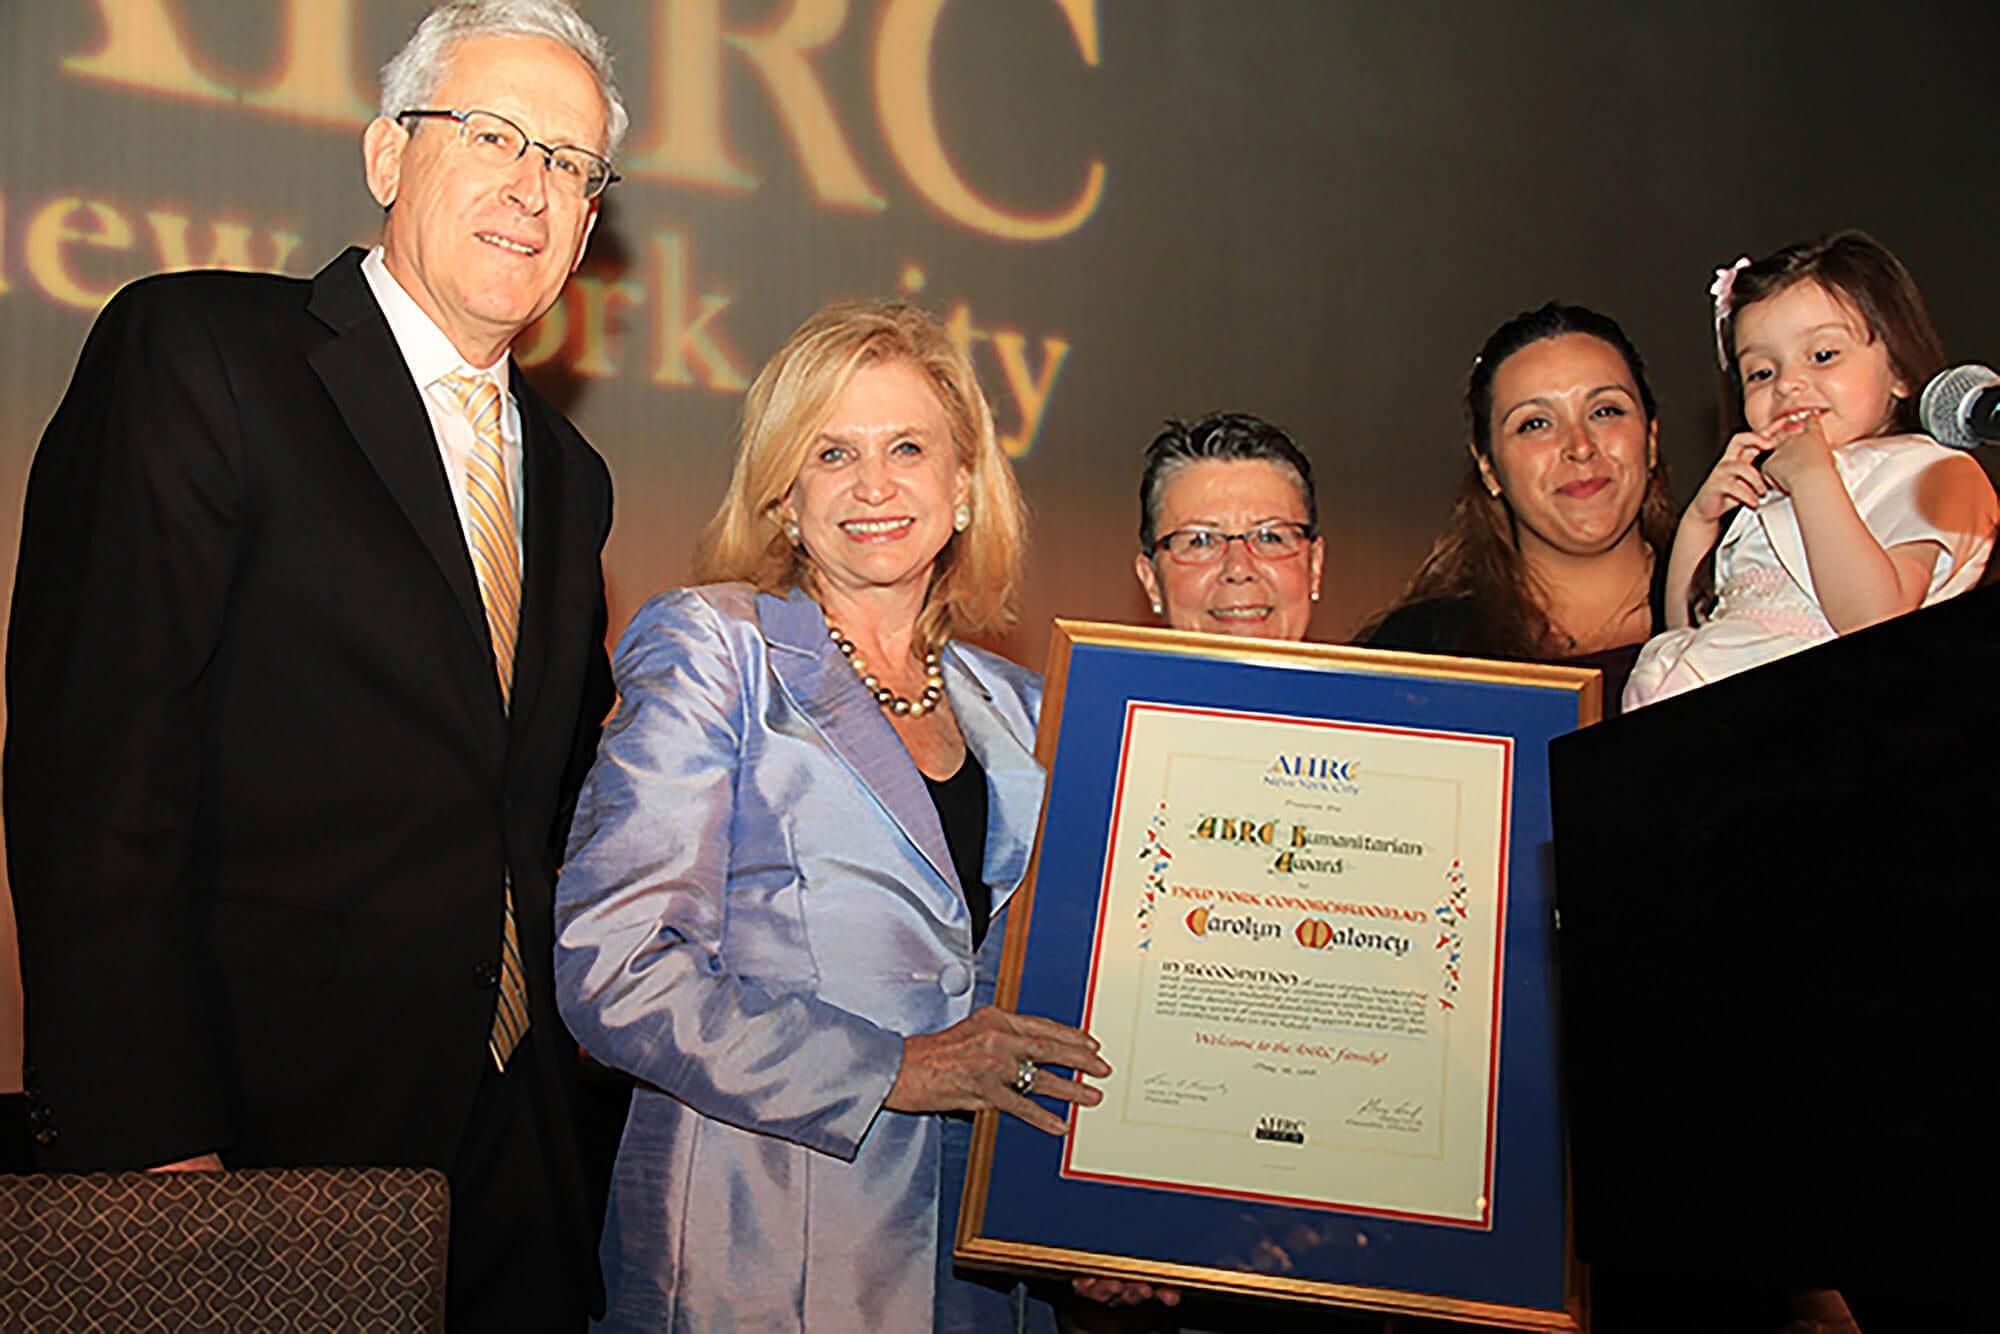 Congresswoman Carolyn B. Maloney, representing the 12th District of New York, receiving the AHRC NYC Humanitarian Award